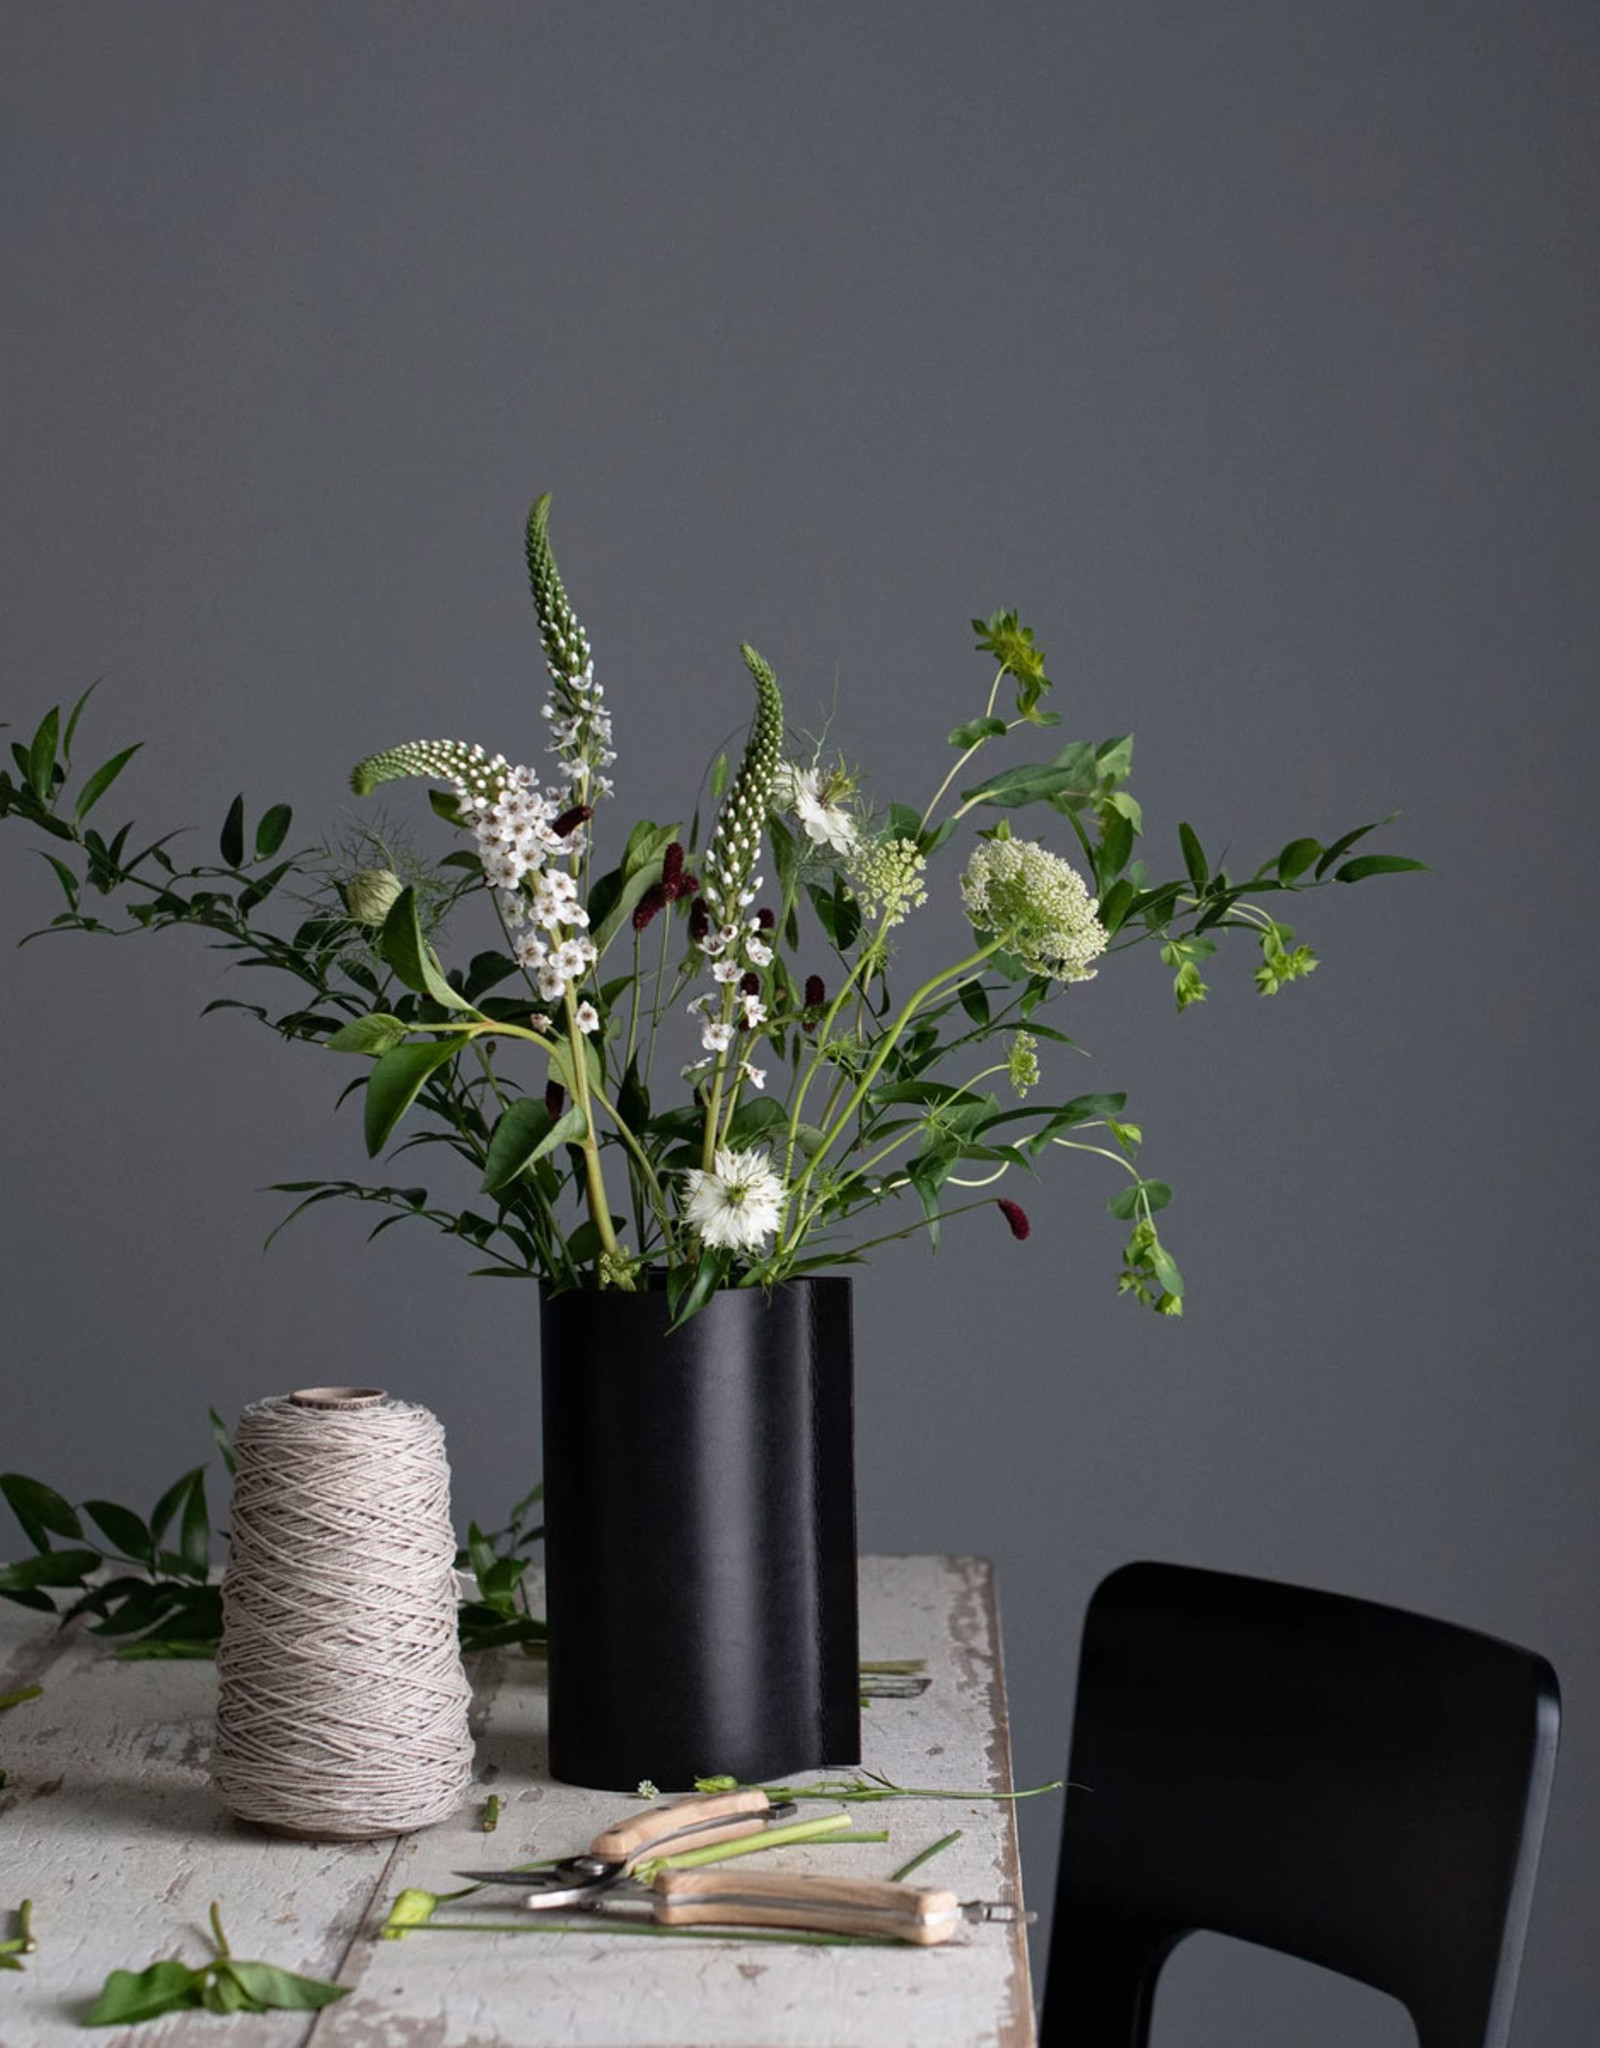 Hold Me Tight vase by Camilla Bjerre & Heidi Høgdall | Black | H300mm x Dia250mm